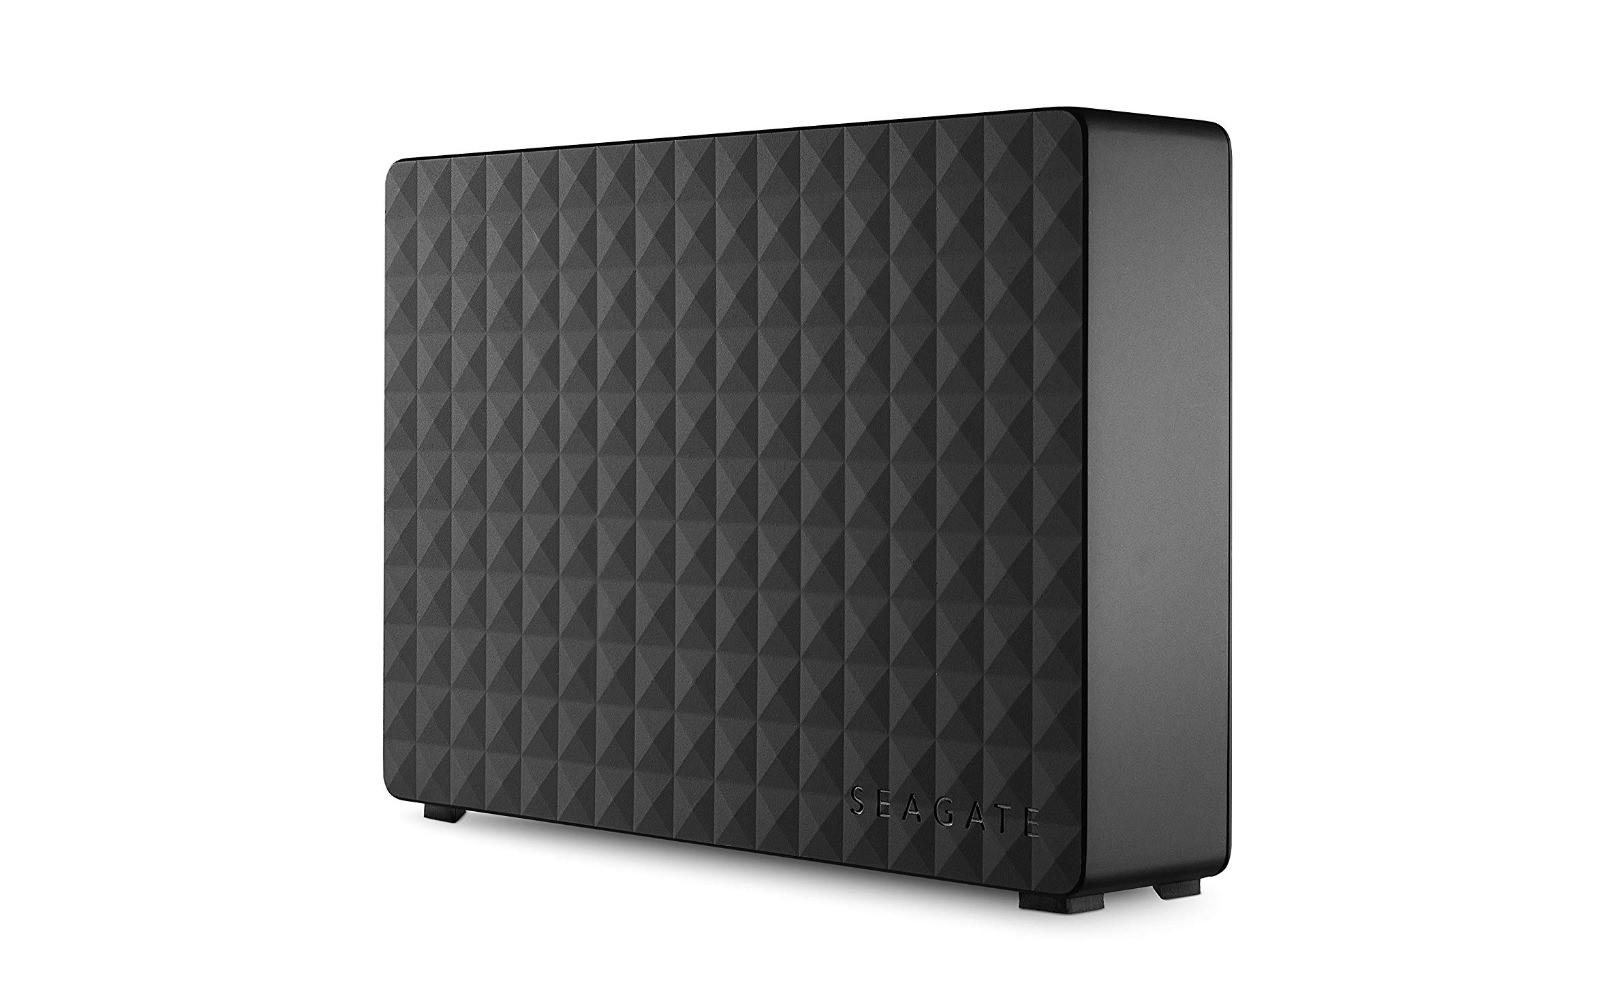 Seagate-HDD-sale.jpg